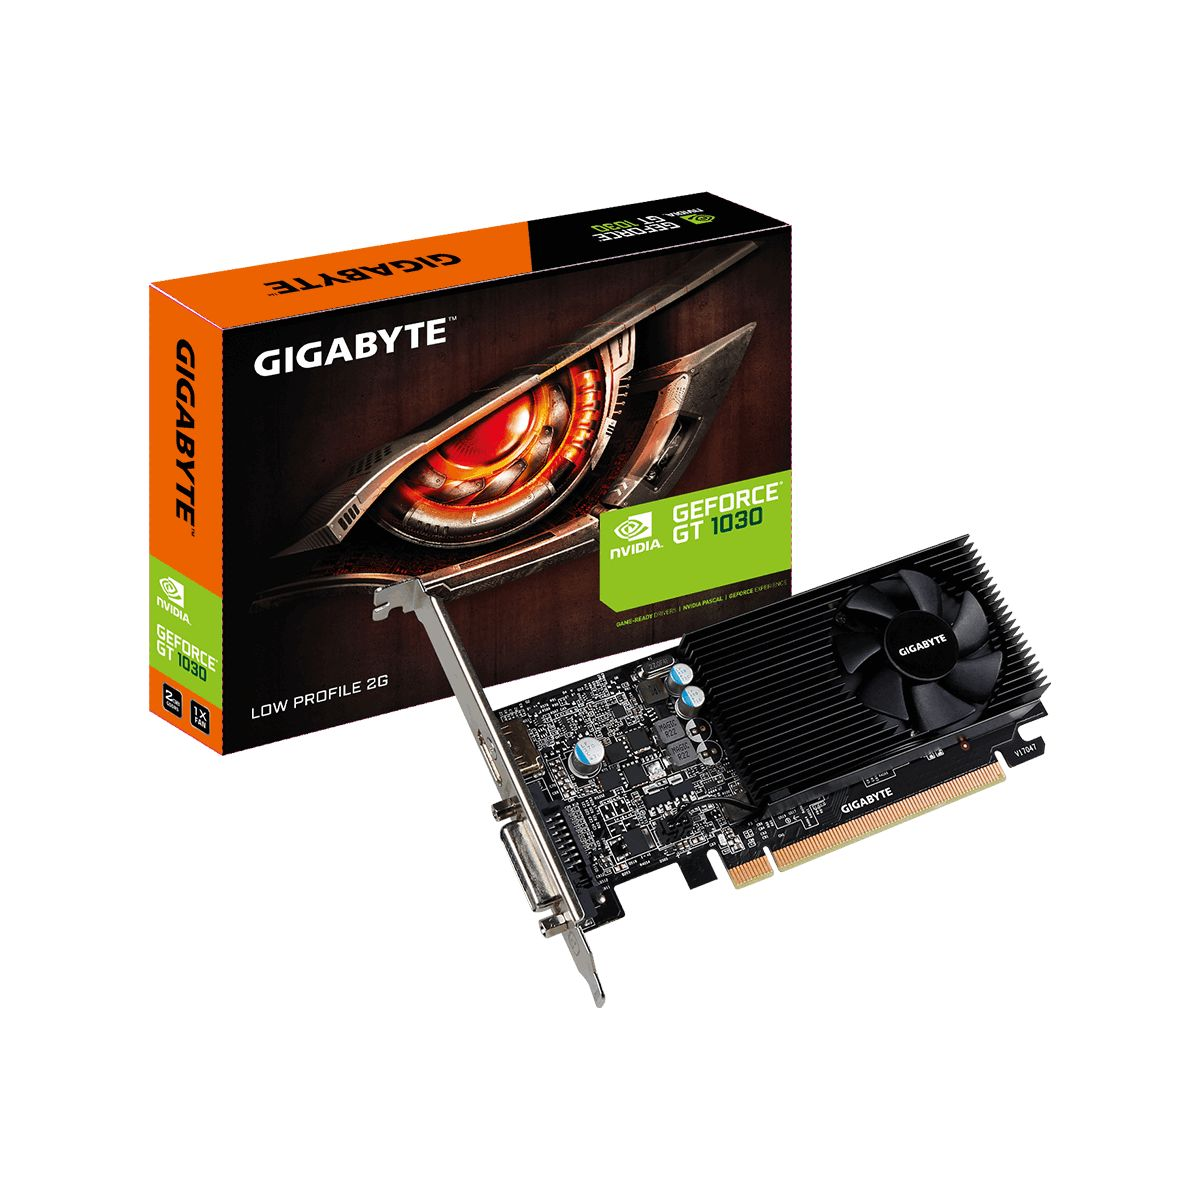 Carte graphique Nvidia GIGABYTE GeForce GT 1030 Low Profile 2G